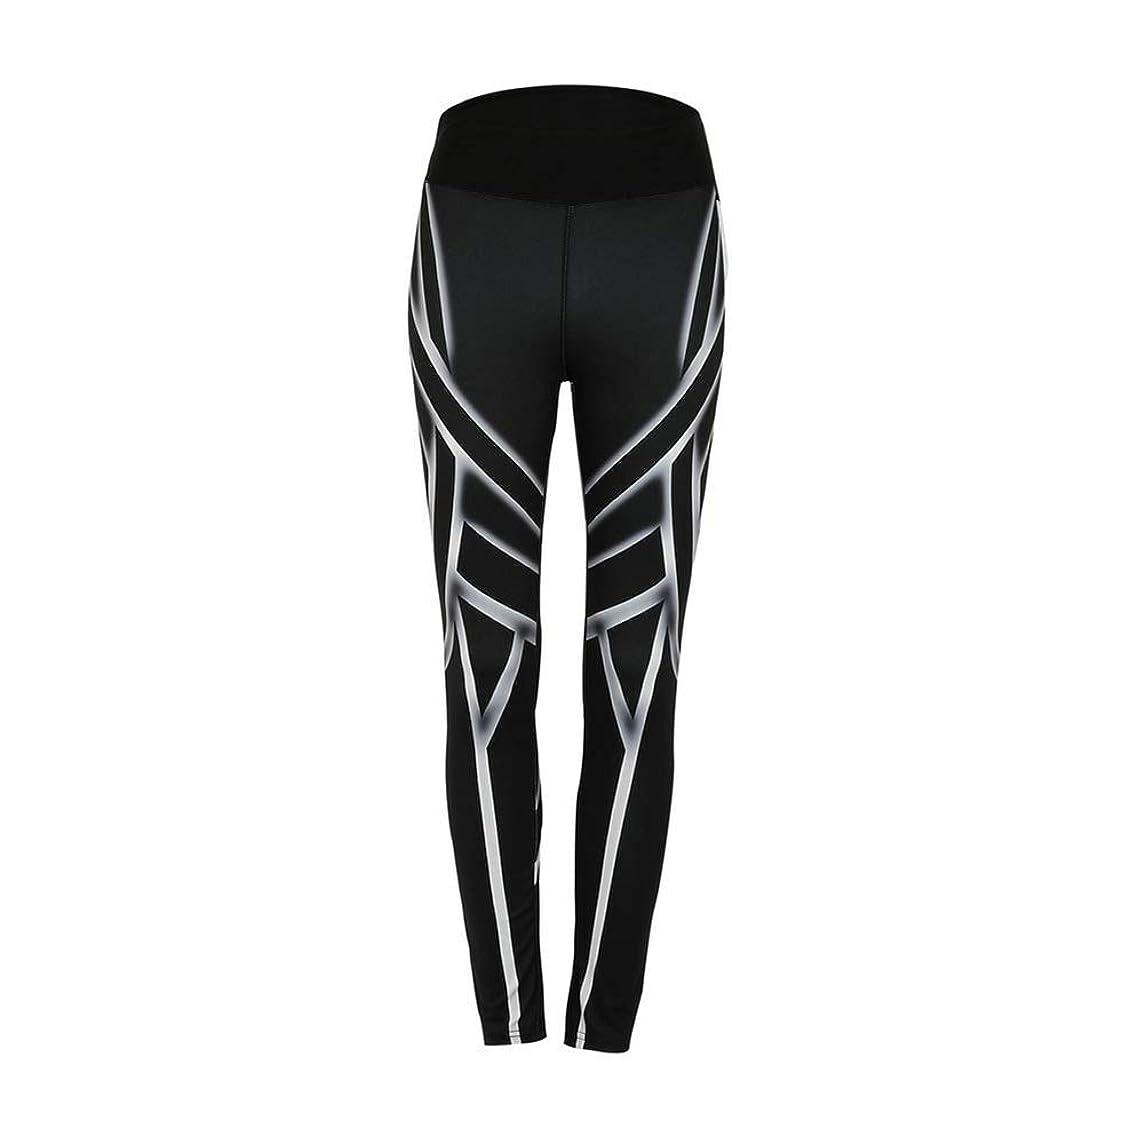 eroute66 High Waist Lines Printed Women Sport Fitness Yoga Leggings Slim Pencil Pants - Black S